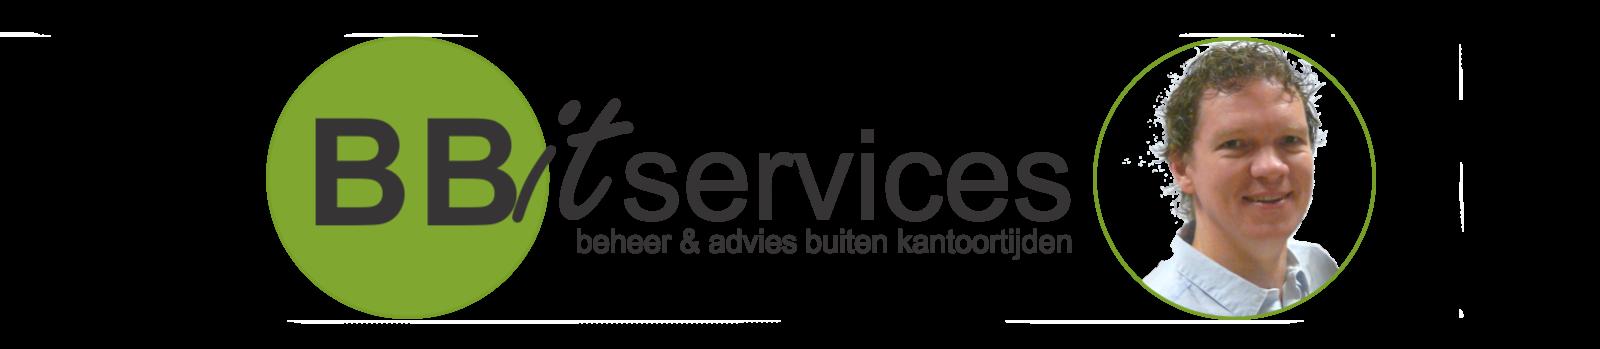 BBit-Services Steenwijk